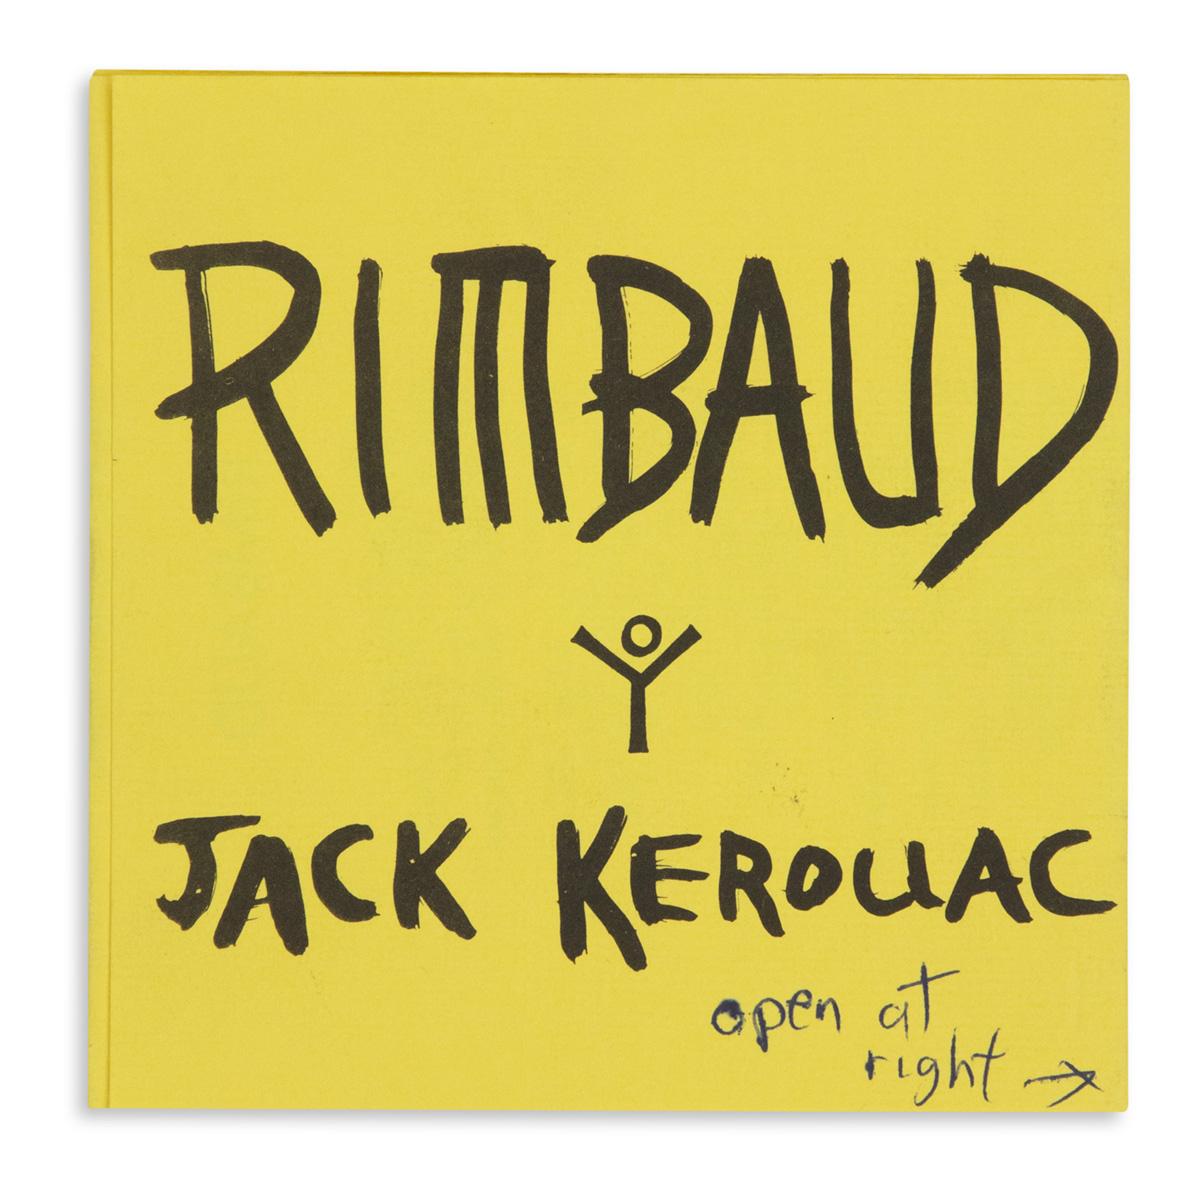 KEROUAC, JACK. Rimbaud (Publishers Archive.)